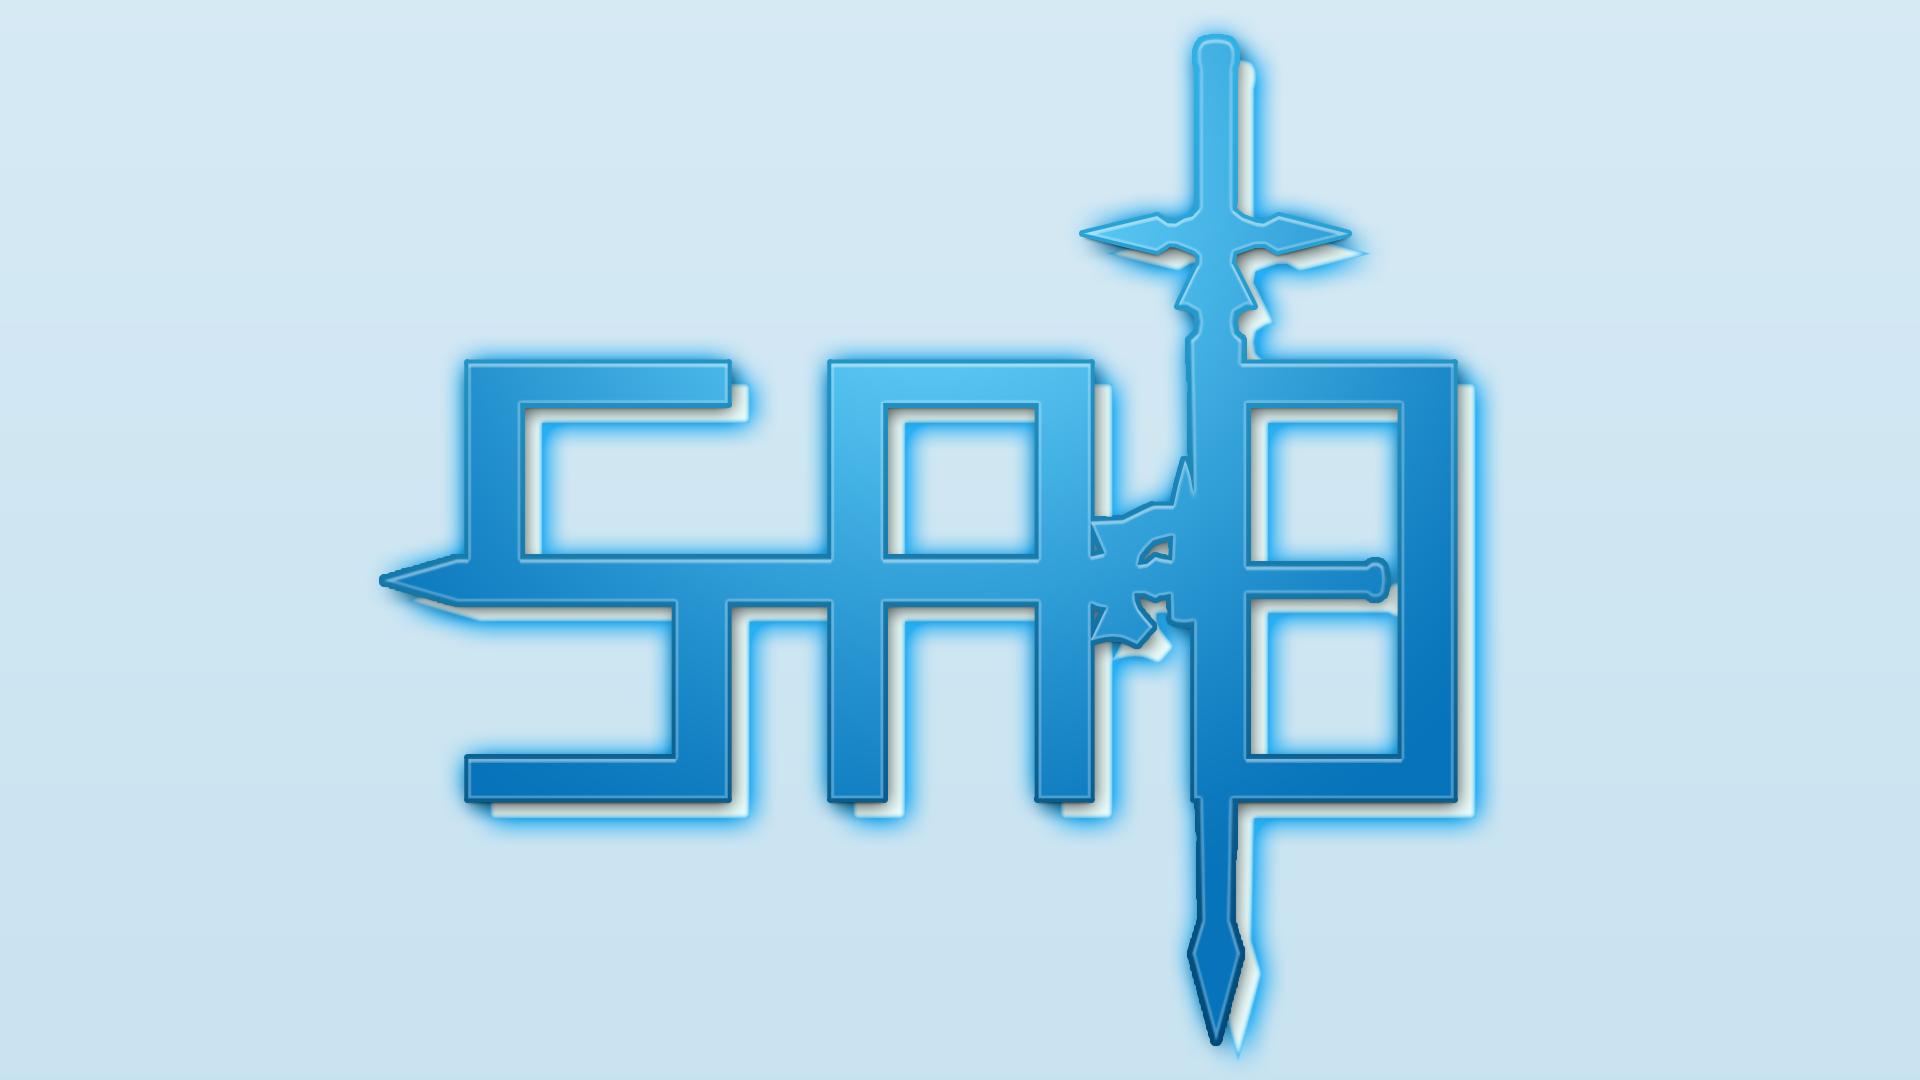 Sao logo 2 by iammrx on deviantart sao logo 2 by iammrx sao logo 2 by iammrx biocorpaavc